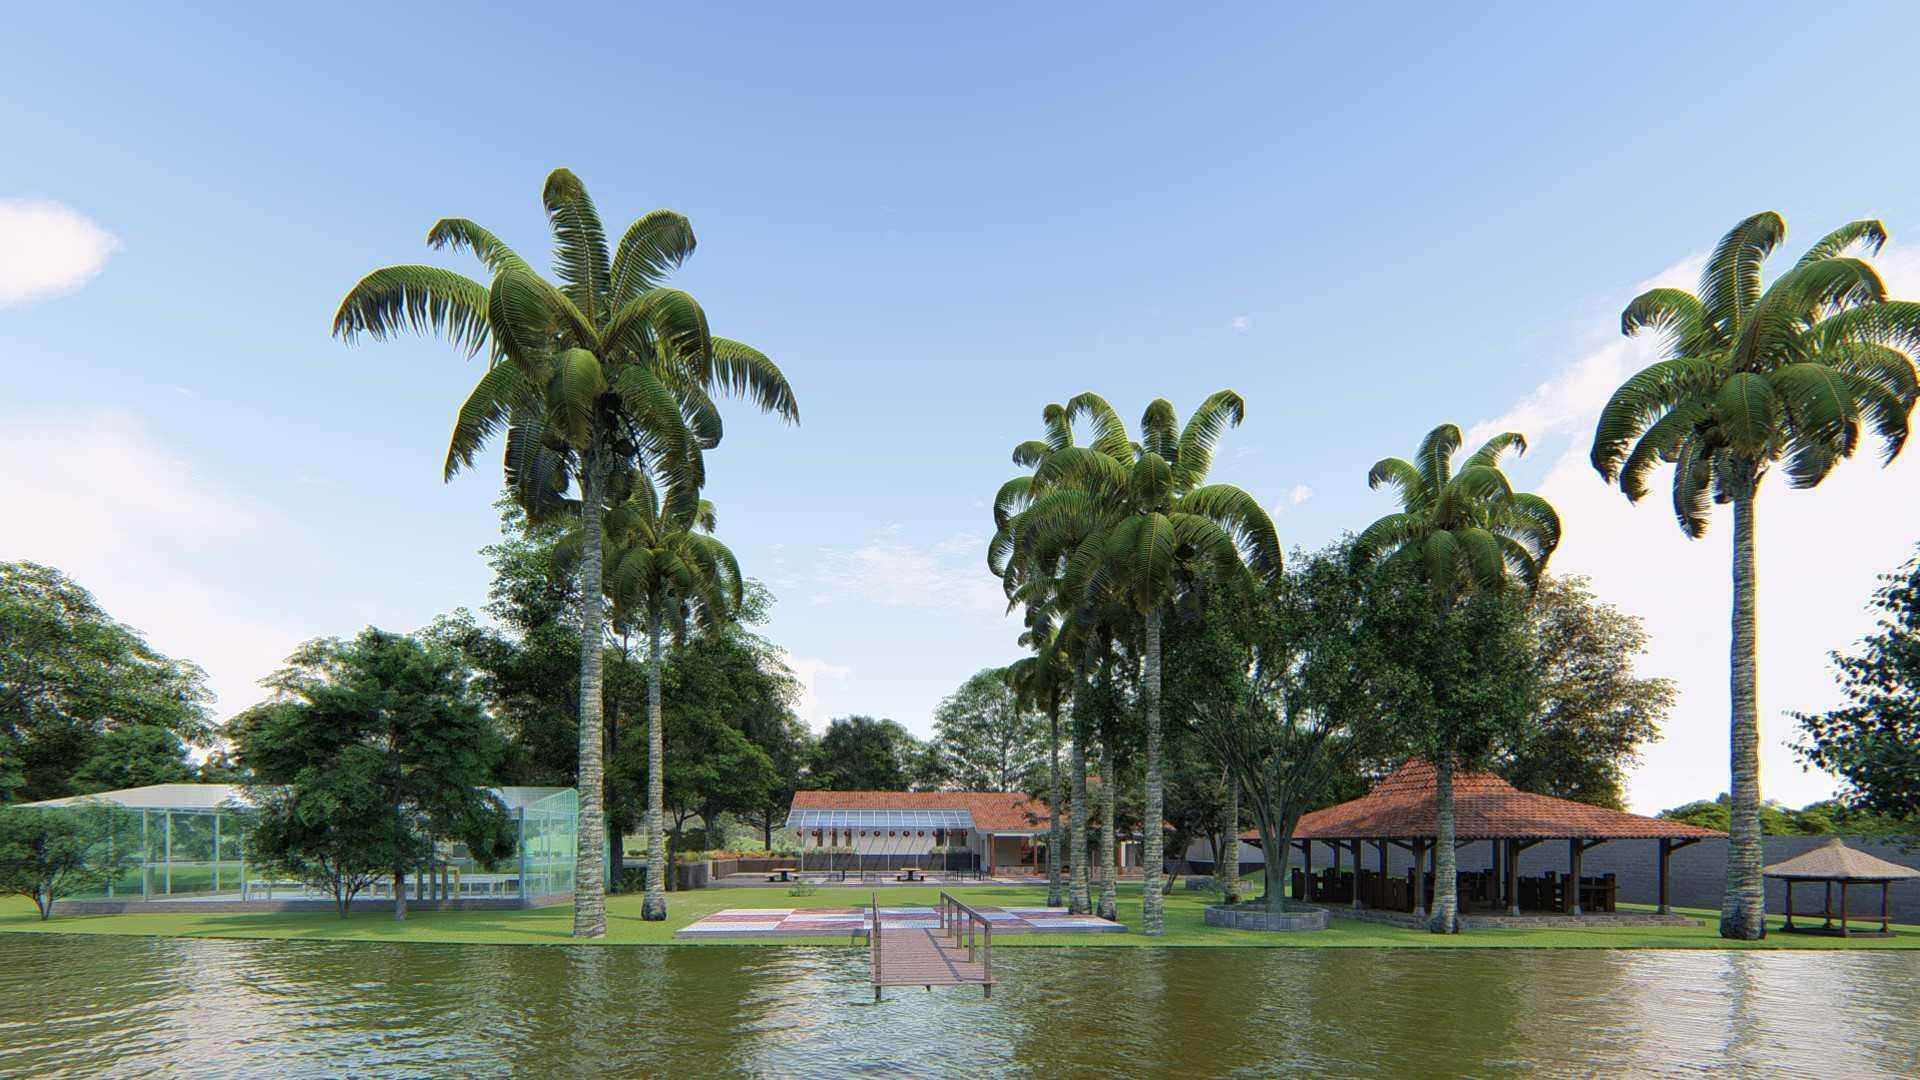 Raden Architect Rumah Wayang Cinwa Bogor, Jawa Barat, Indonesia Bogor, Jawa Barat, Indonesia Raden-Architect-Rumah-Wayang-Cinwa   79838